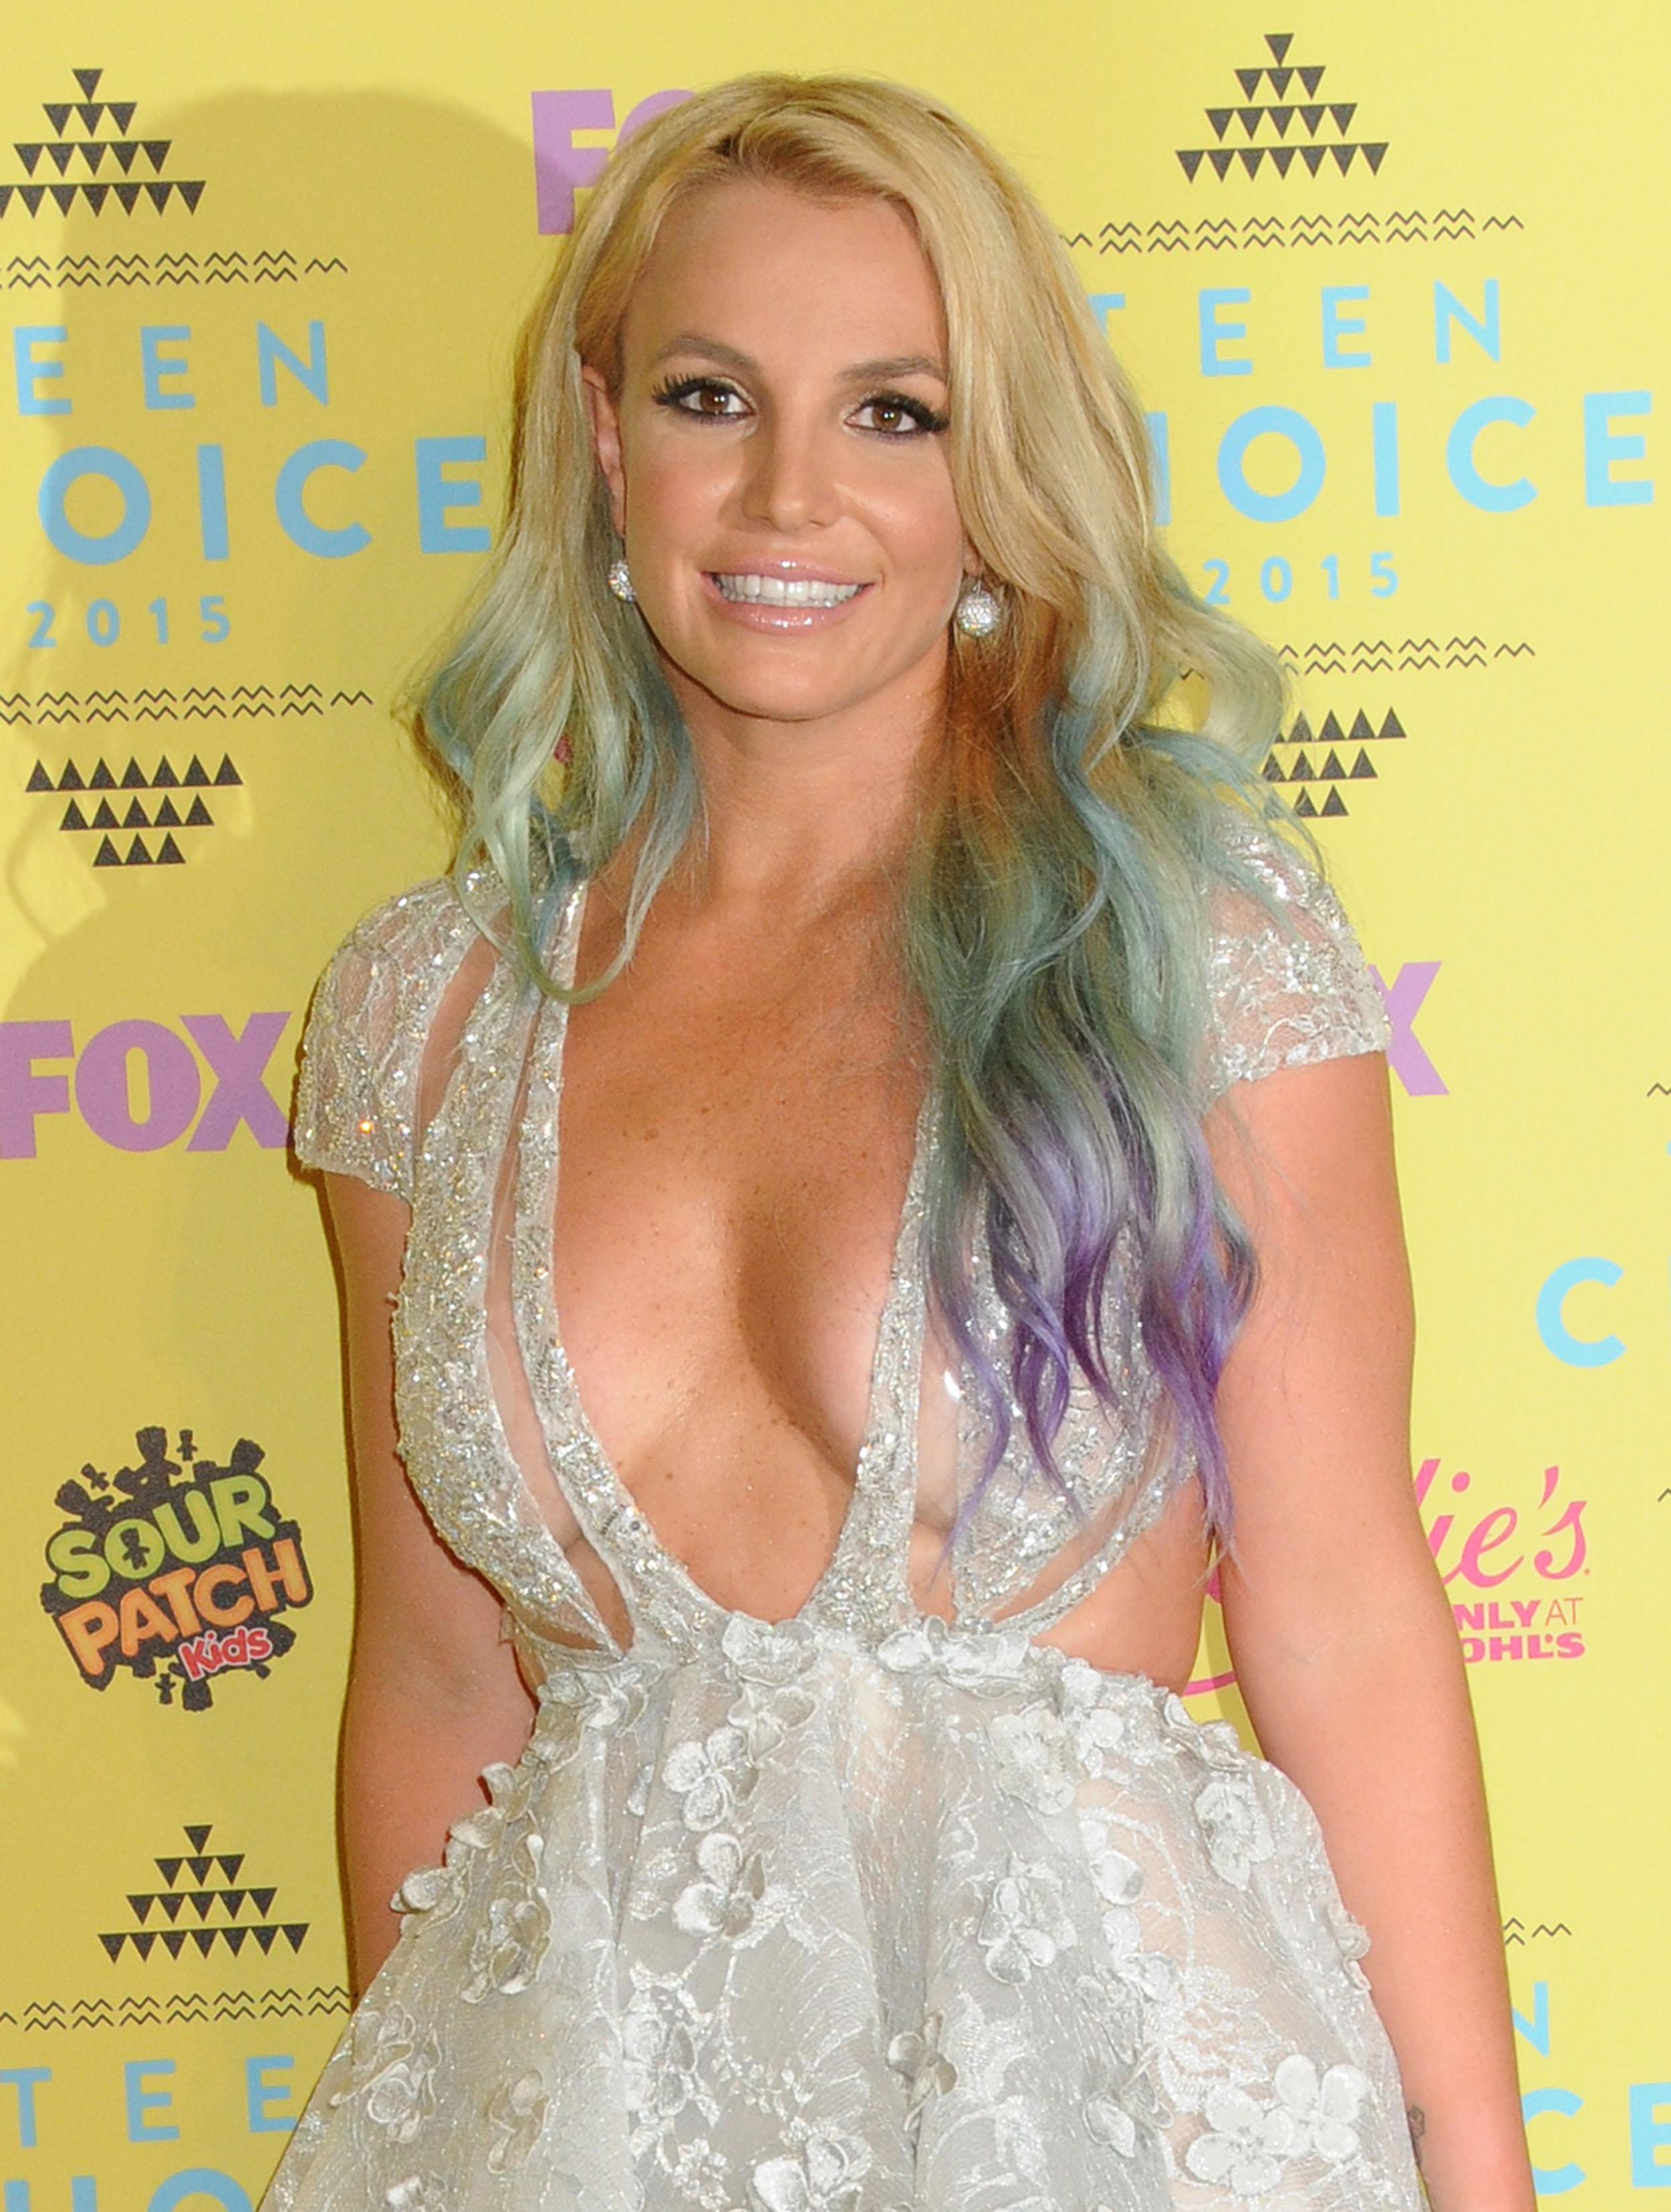 Britney celebrity spear upskirt looks damn